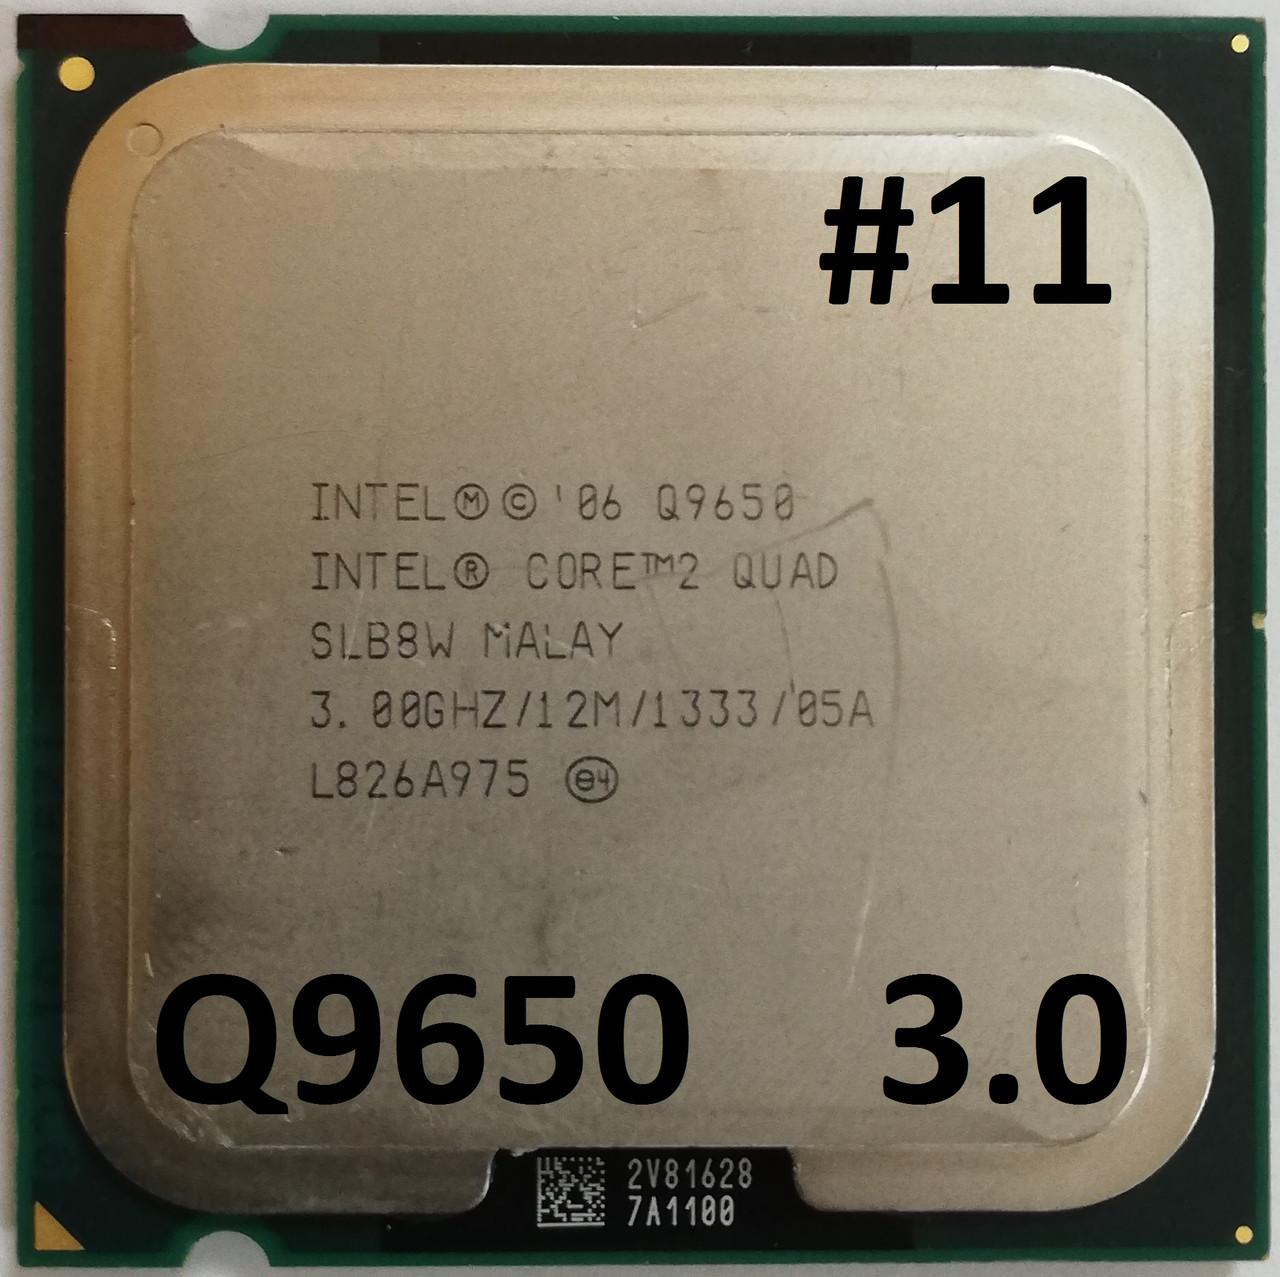 Процессор ЛОТ #11 Intel® Core™2 Quad Q9650 SLB8W  3.0GHz 12M Cache 1333 MHz FSB Soket 775 Б/У